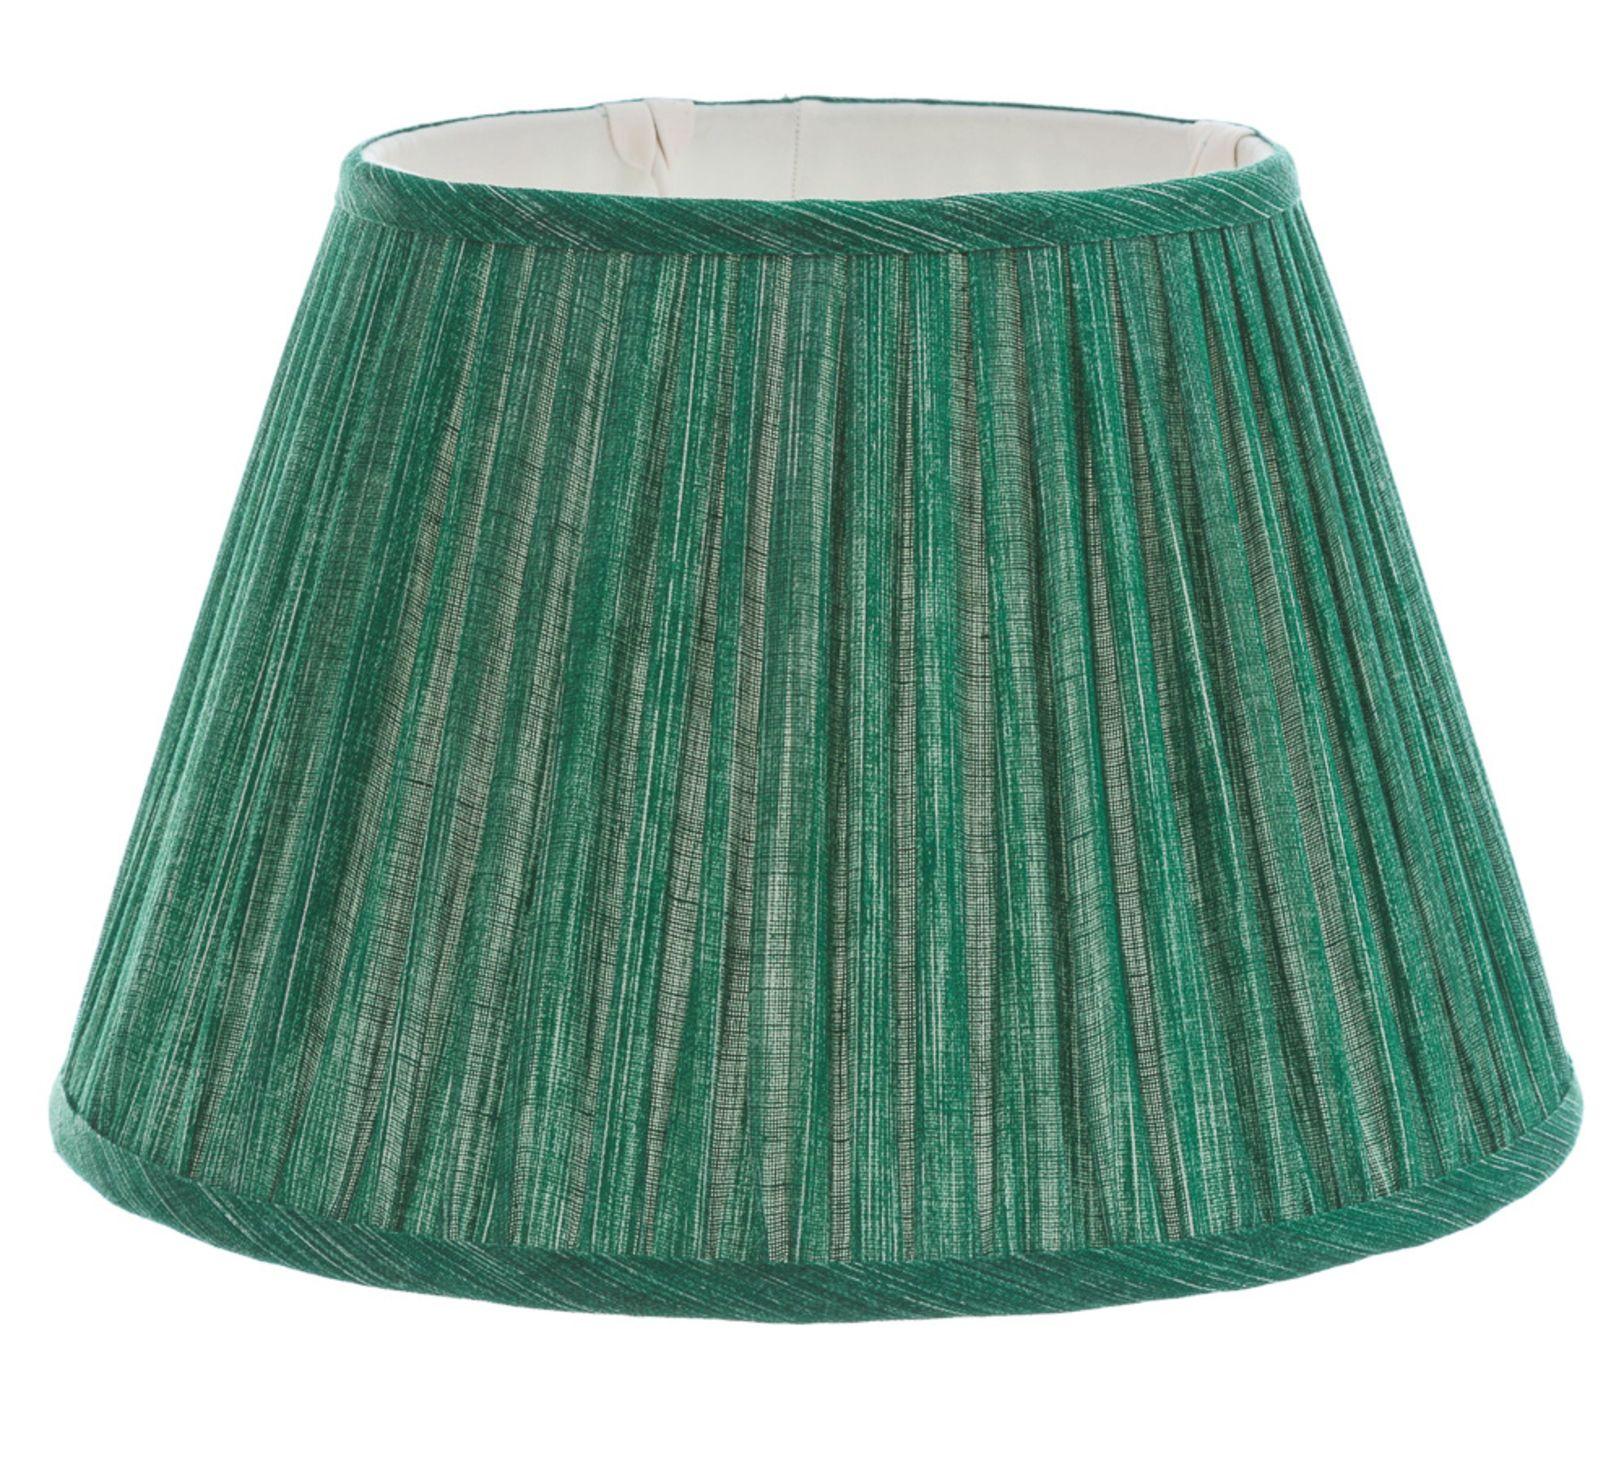 4 5 Inch Gathered Bedwyn Aventurine Plain Light Linen Linen Lampshades Lampshades Lamp Shade